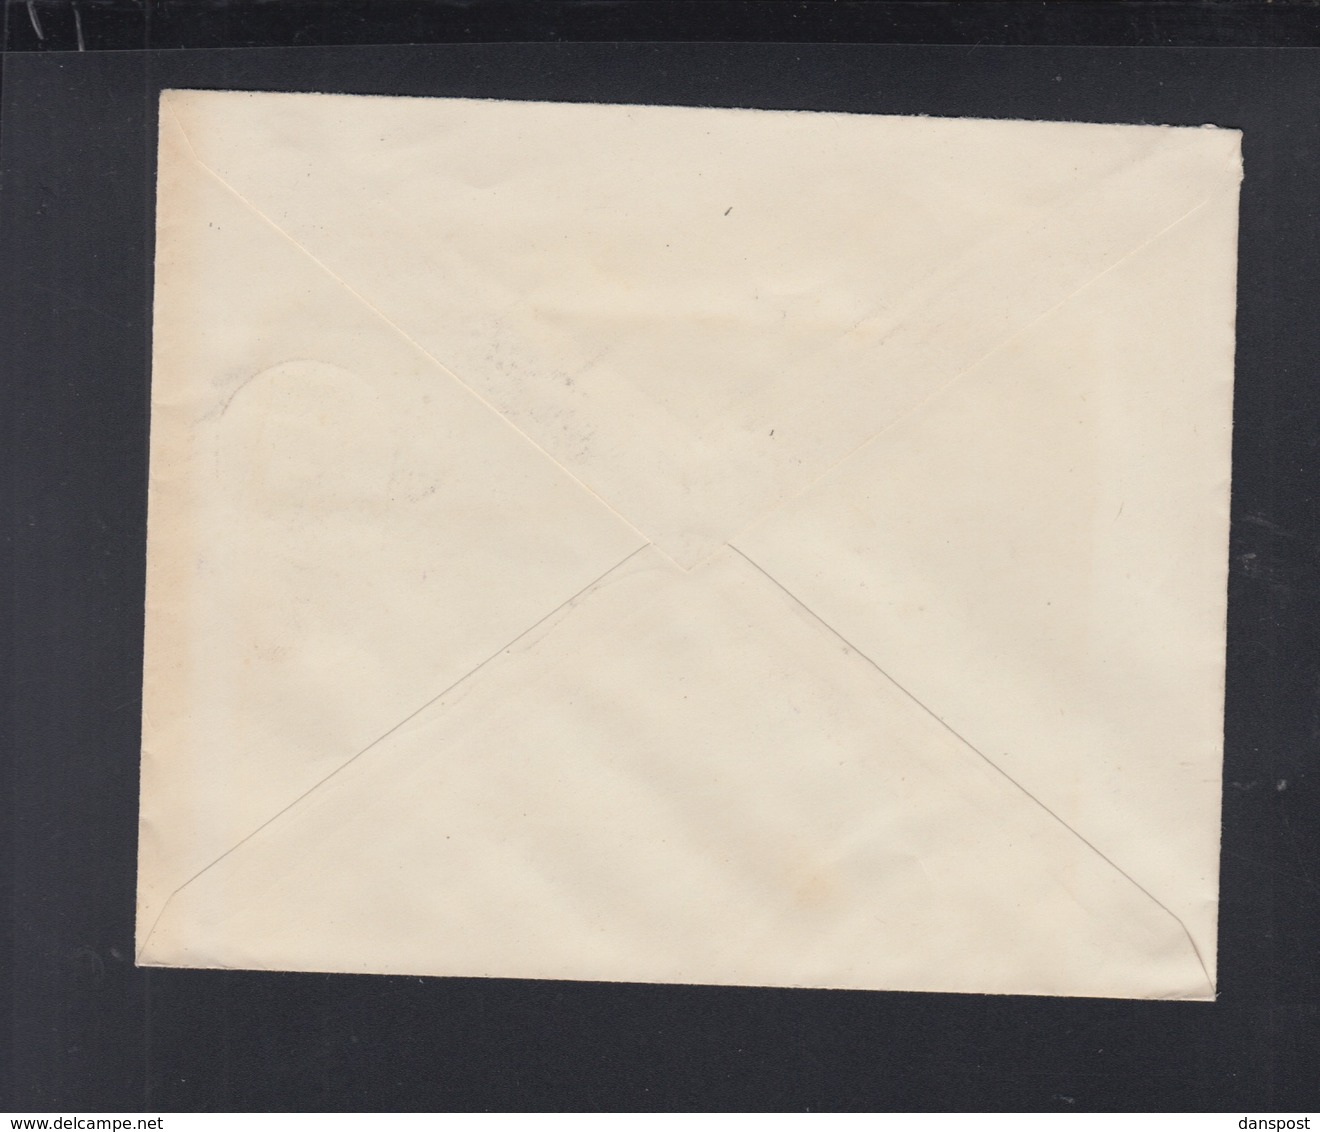 Bayern Brief 1920 Knagge & Peitz München - Bayern